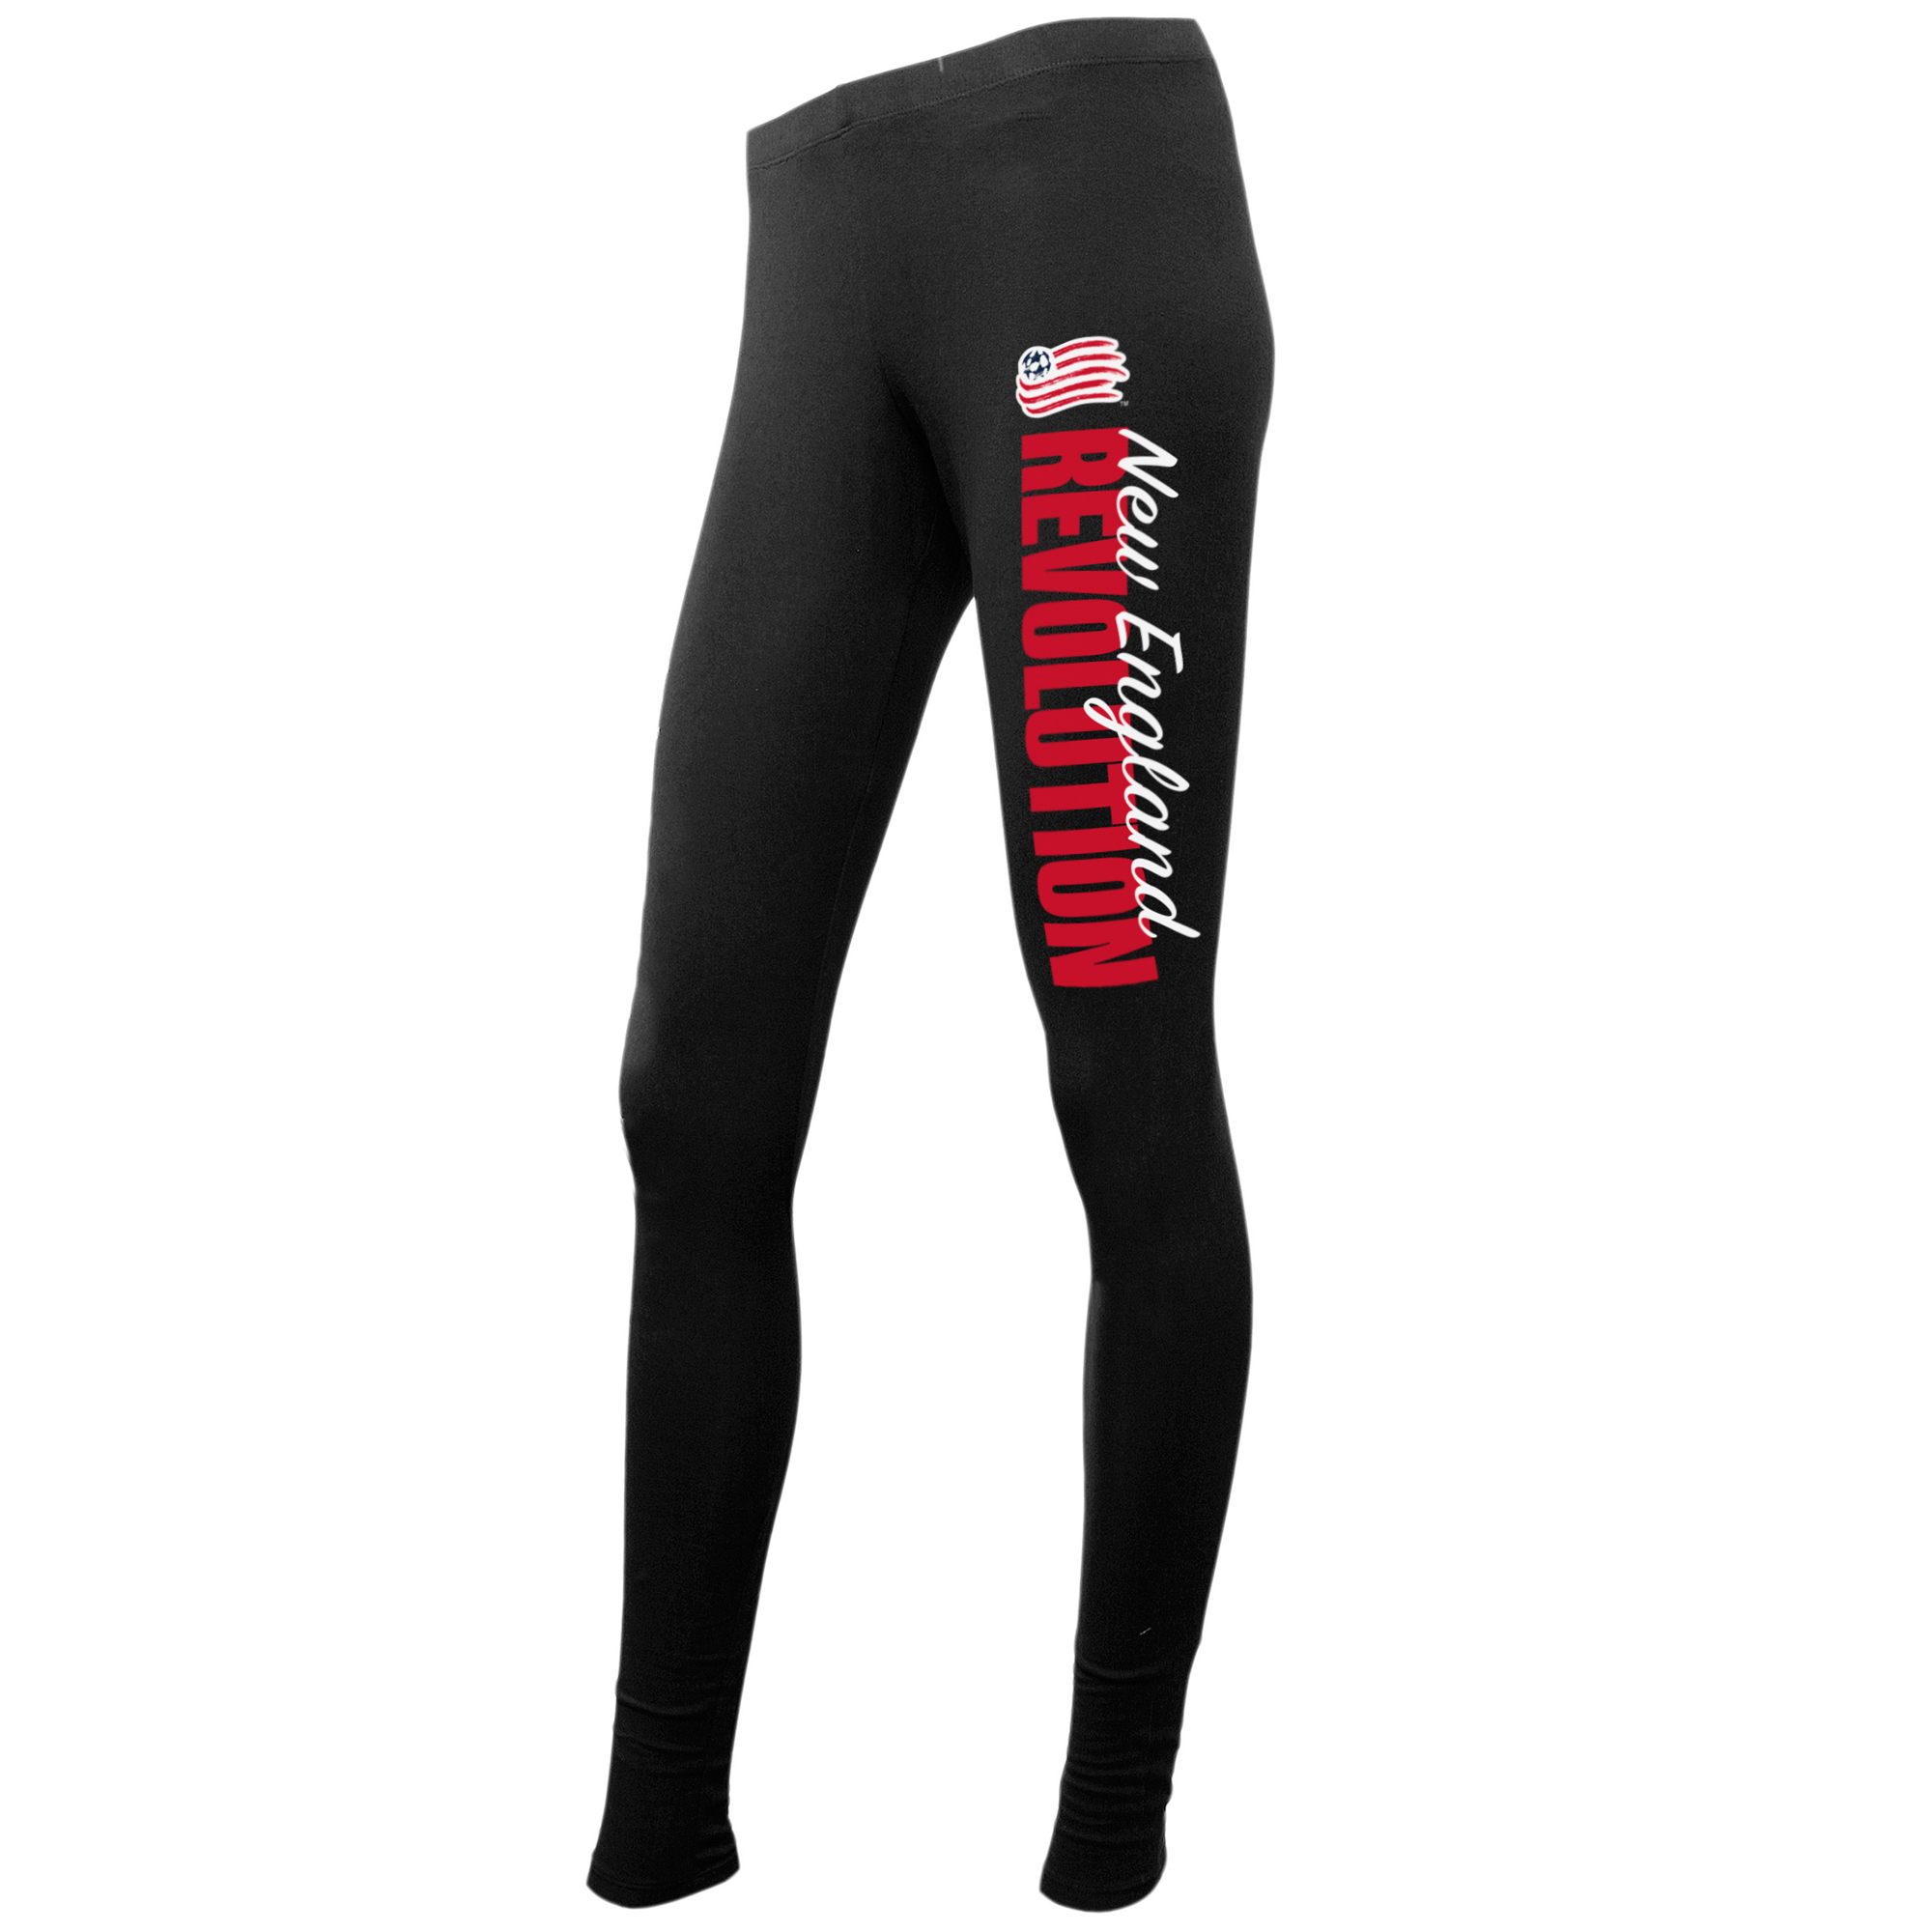 Concepts Sport Atlanta United FC Leggings Latitude Yoga Pants